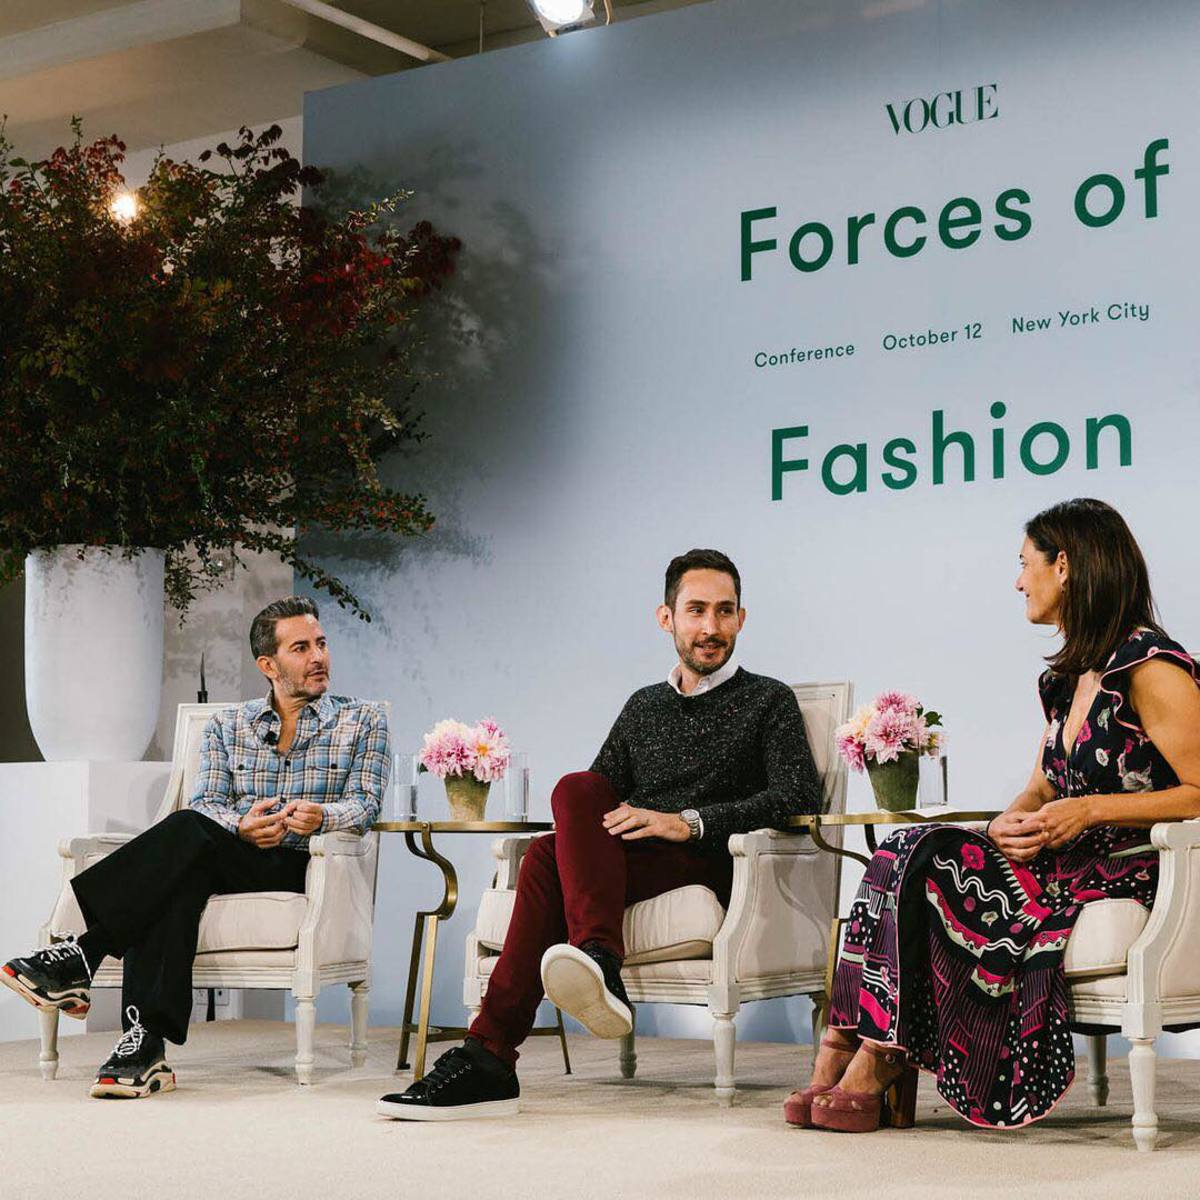 Marc Jacobs, Instagram CEO Kevin Systrom and Vogue.com Digital Creative Director Sally Singer. Photo: @voguemagazine/Instagram